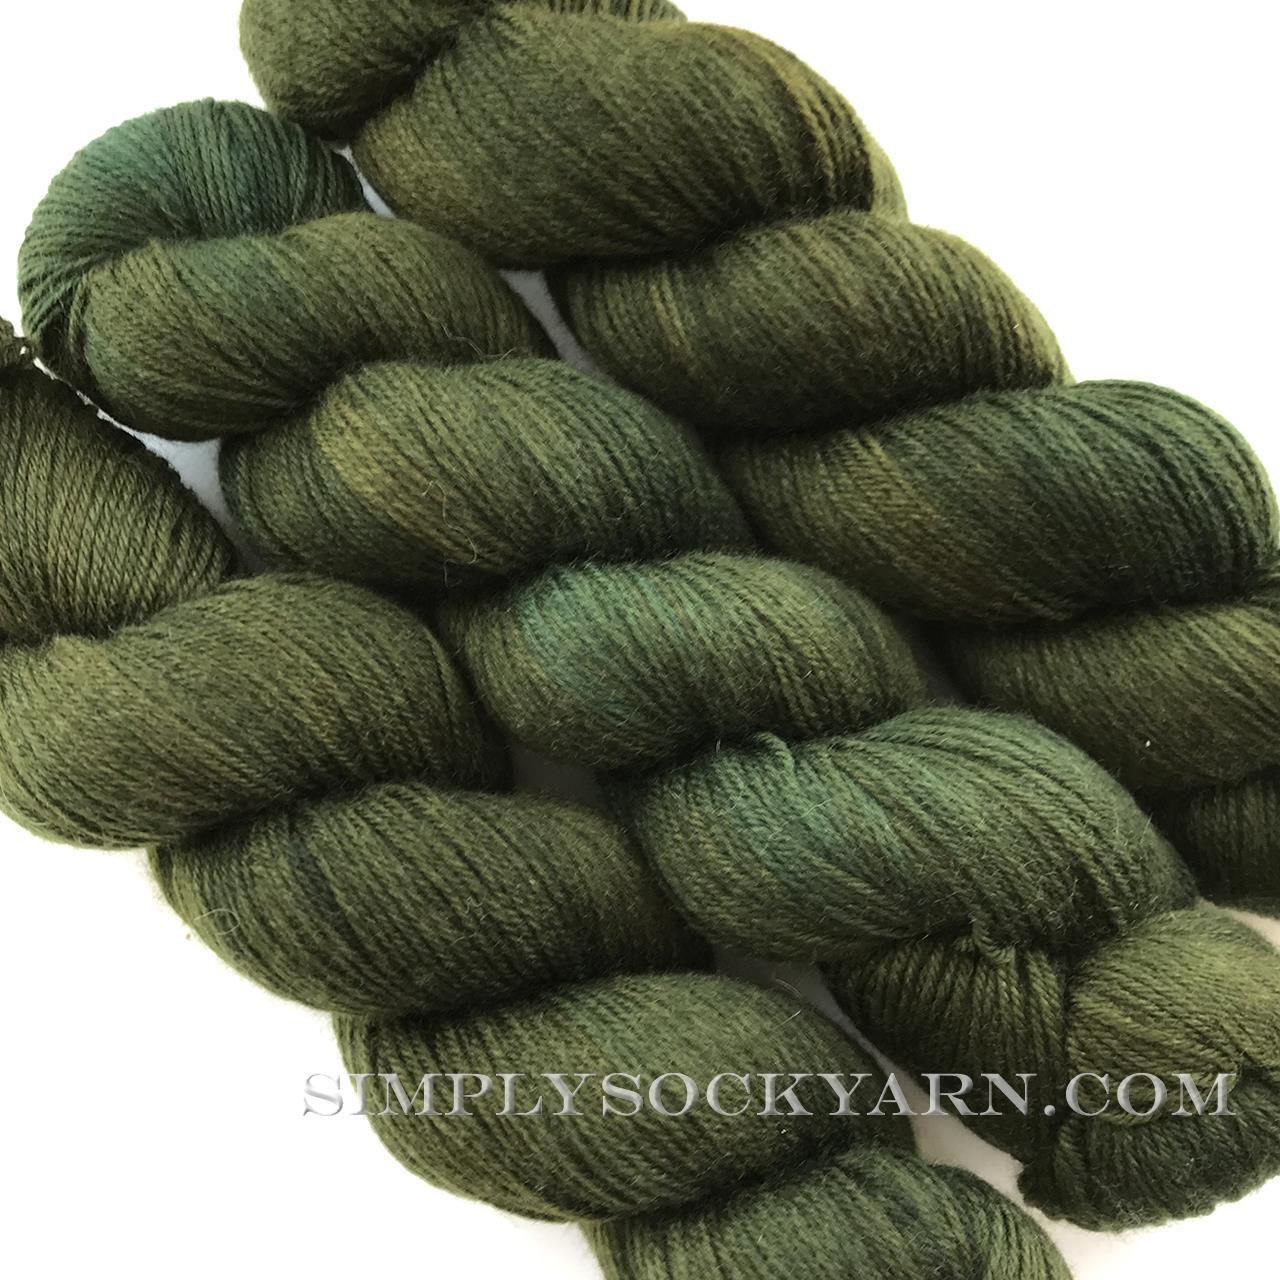 Qing Super Soft Sock Dk Forest -